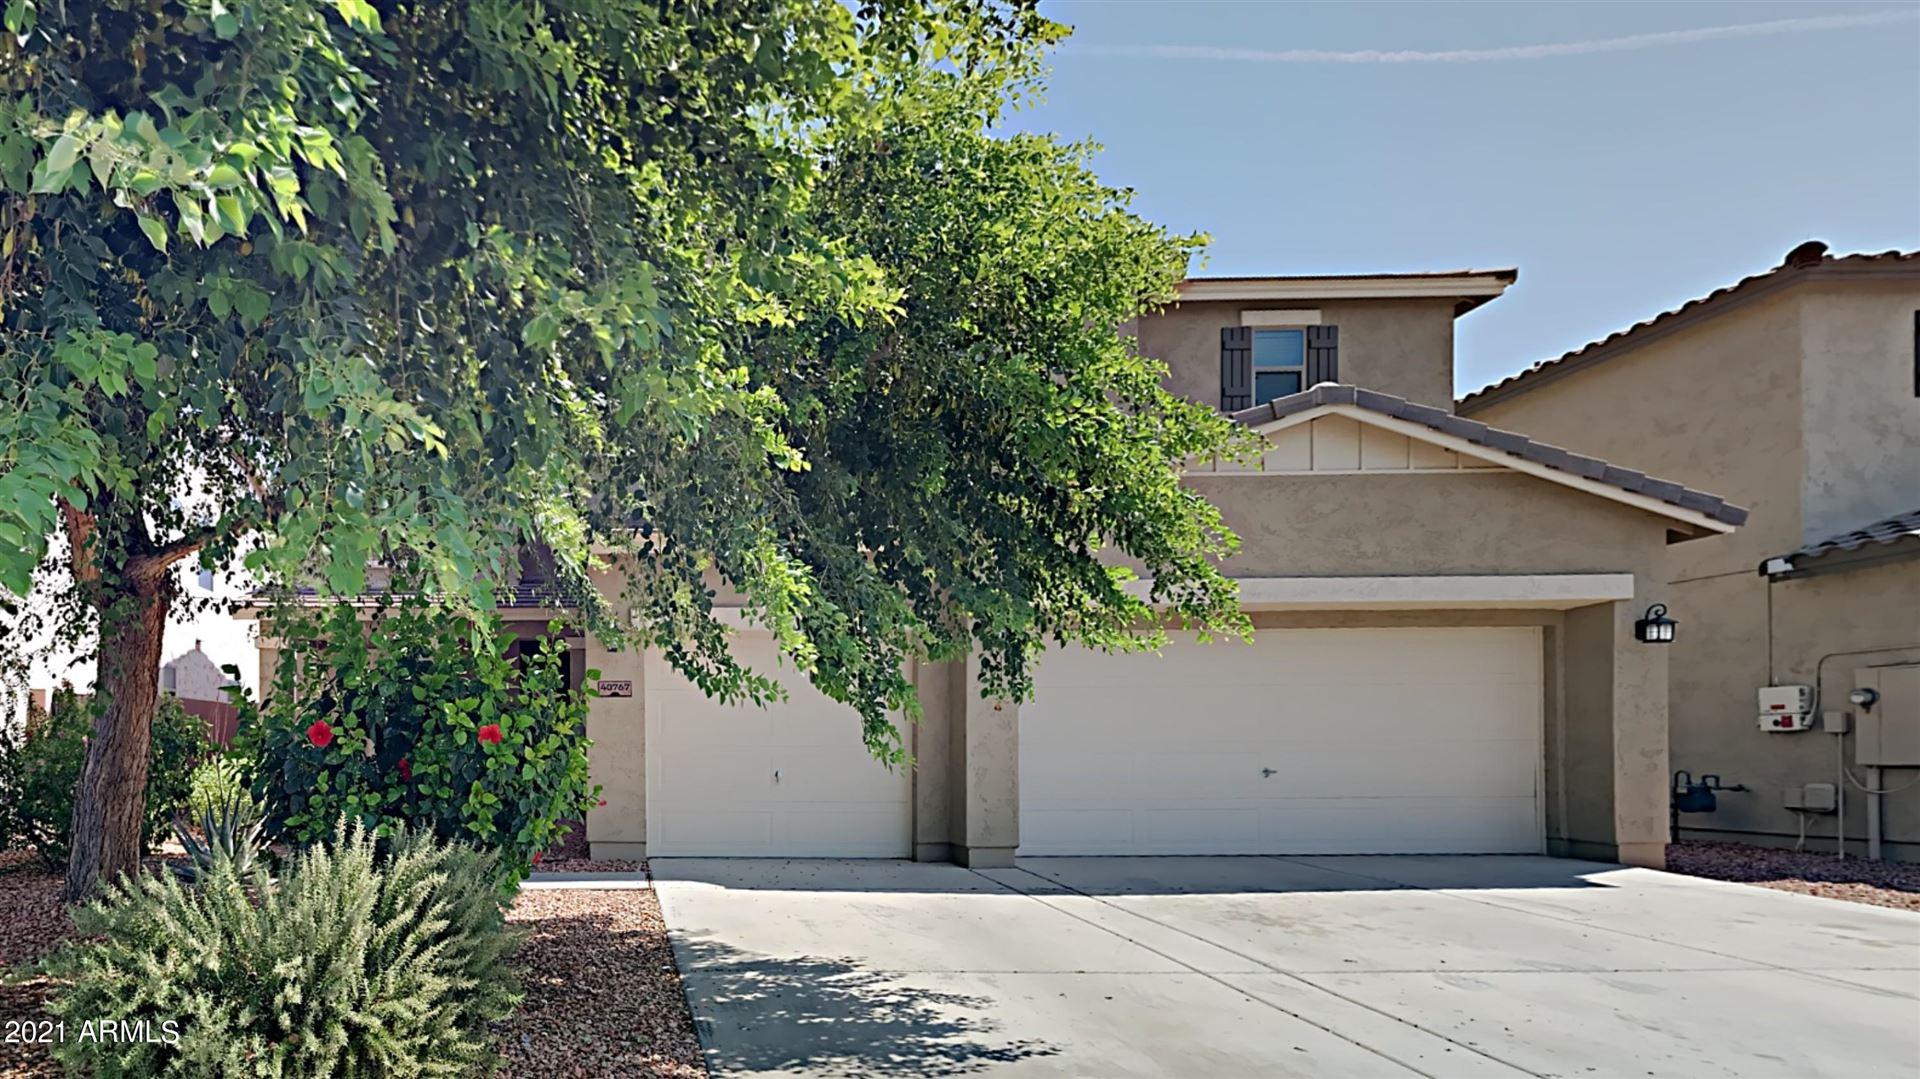 Photo for 40767 W COLBY Drive, Maricopa, AZ 85138 (MLS # 6278111)